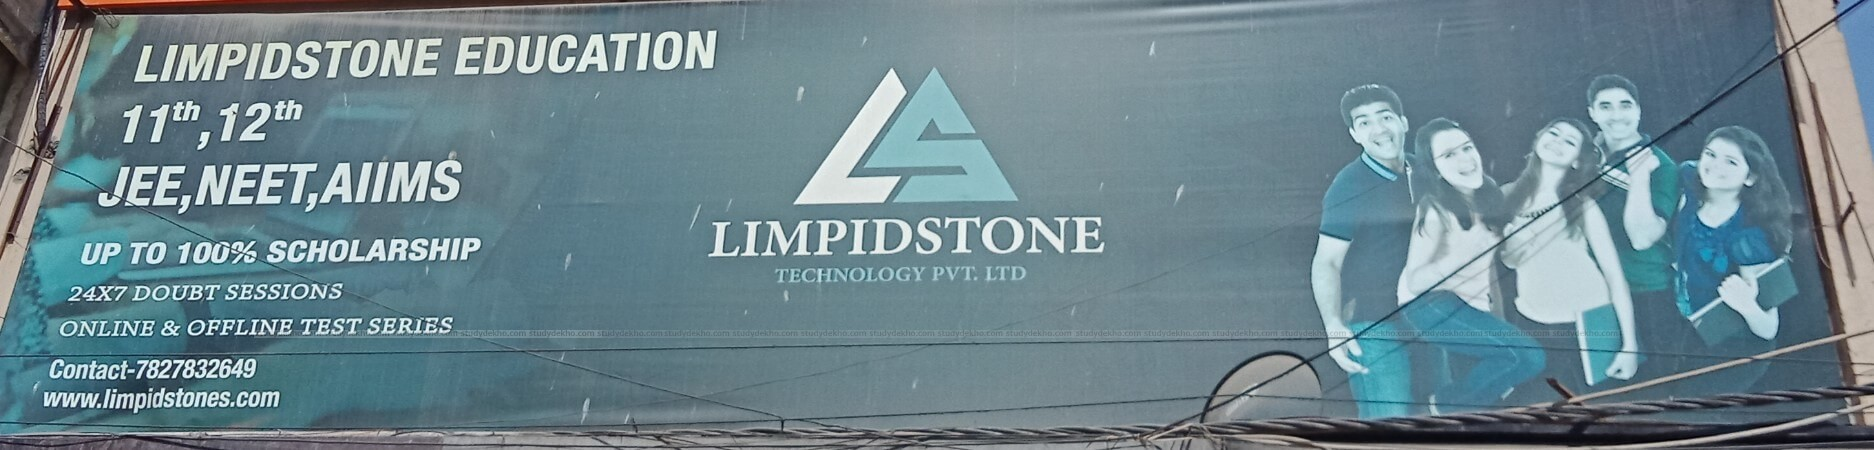 LIMPIDSTONE EDUCATION Logo